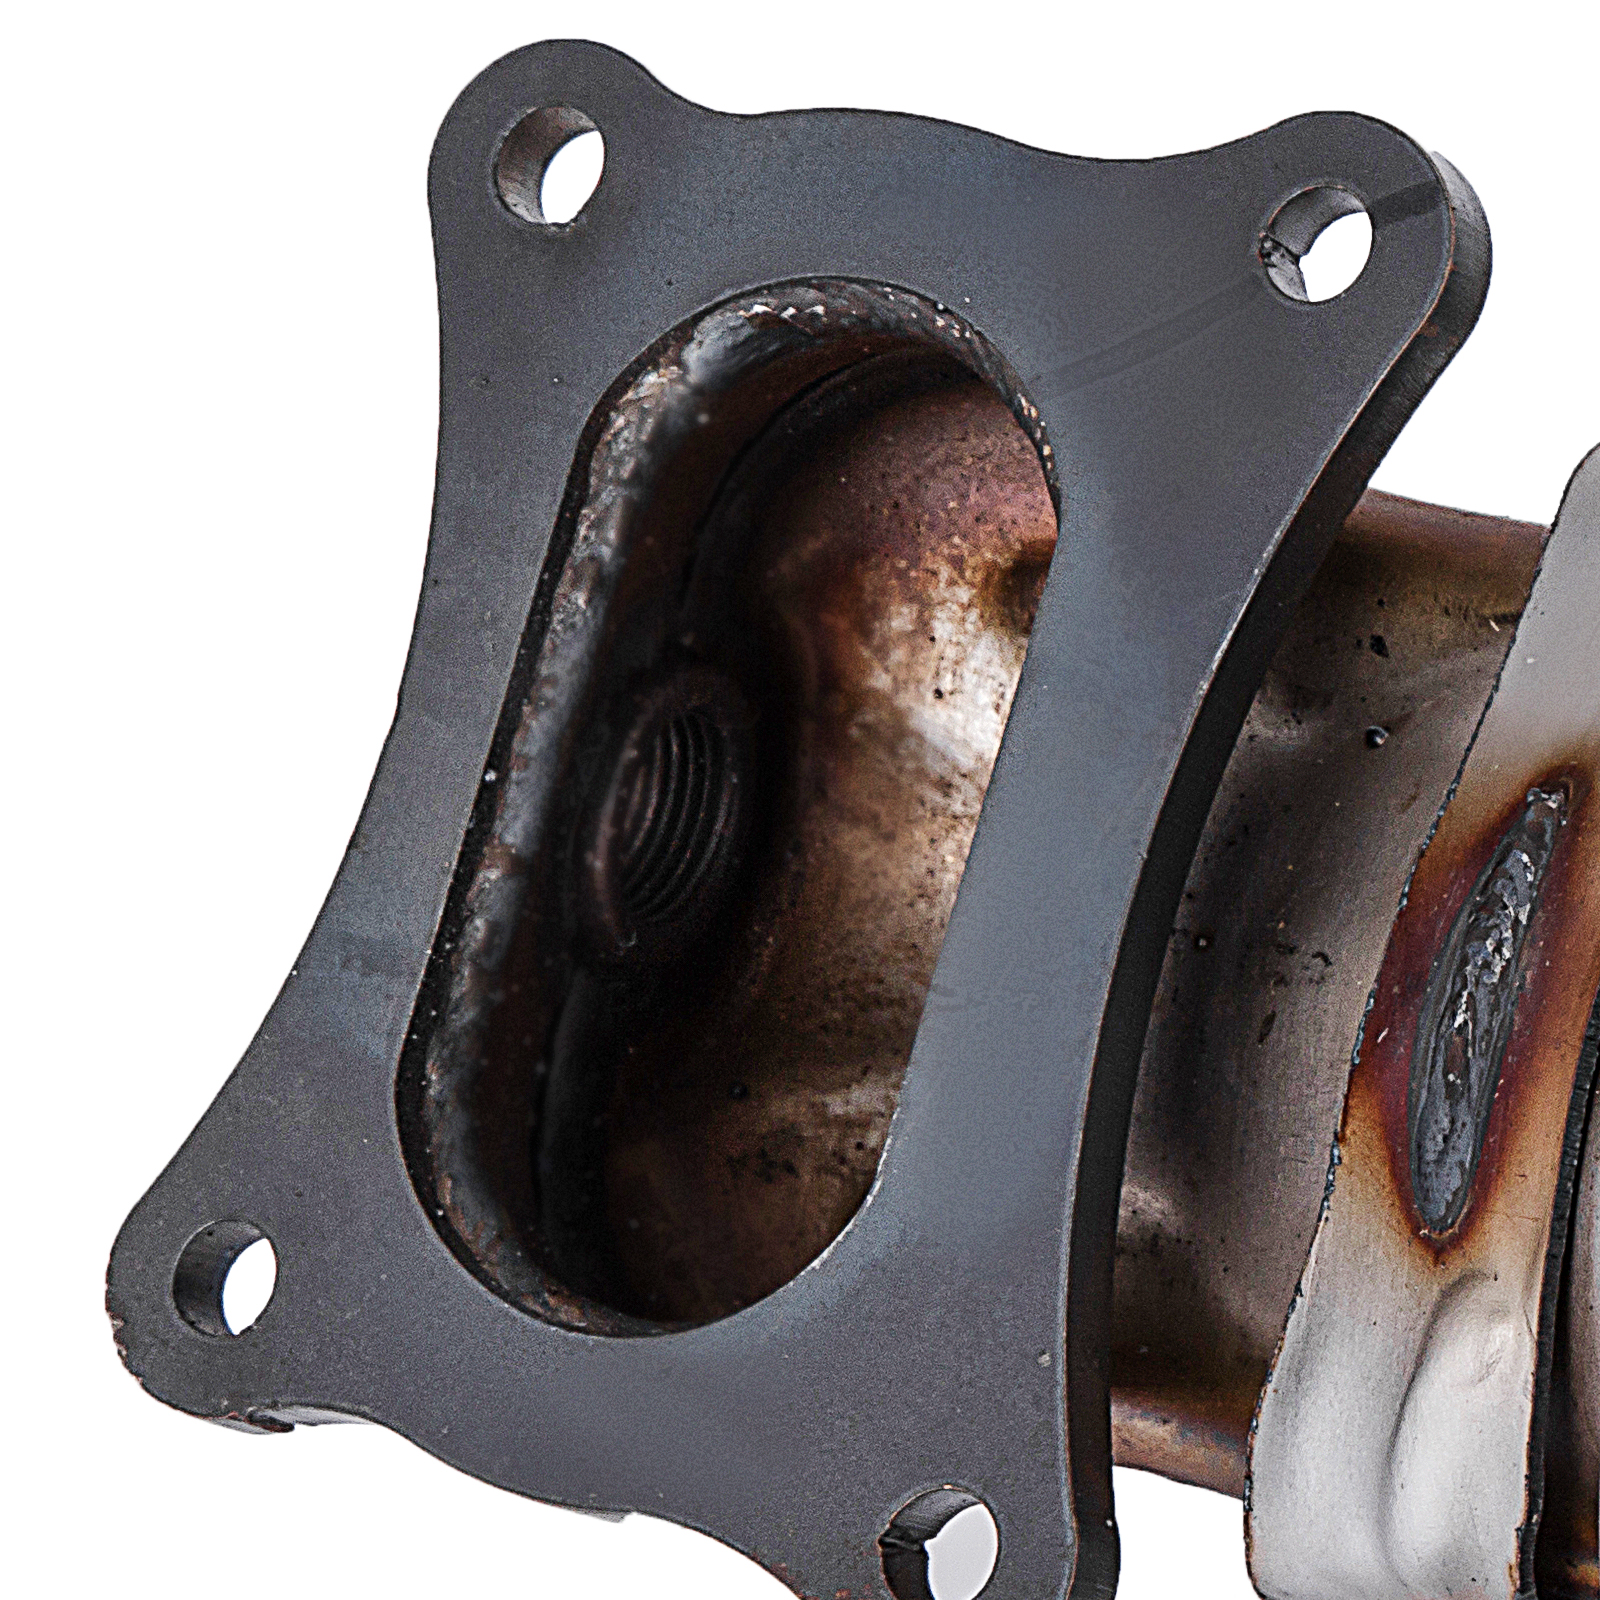 Set Catalytic Converter Fits Radiator Side Pilot/Ridgeline